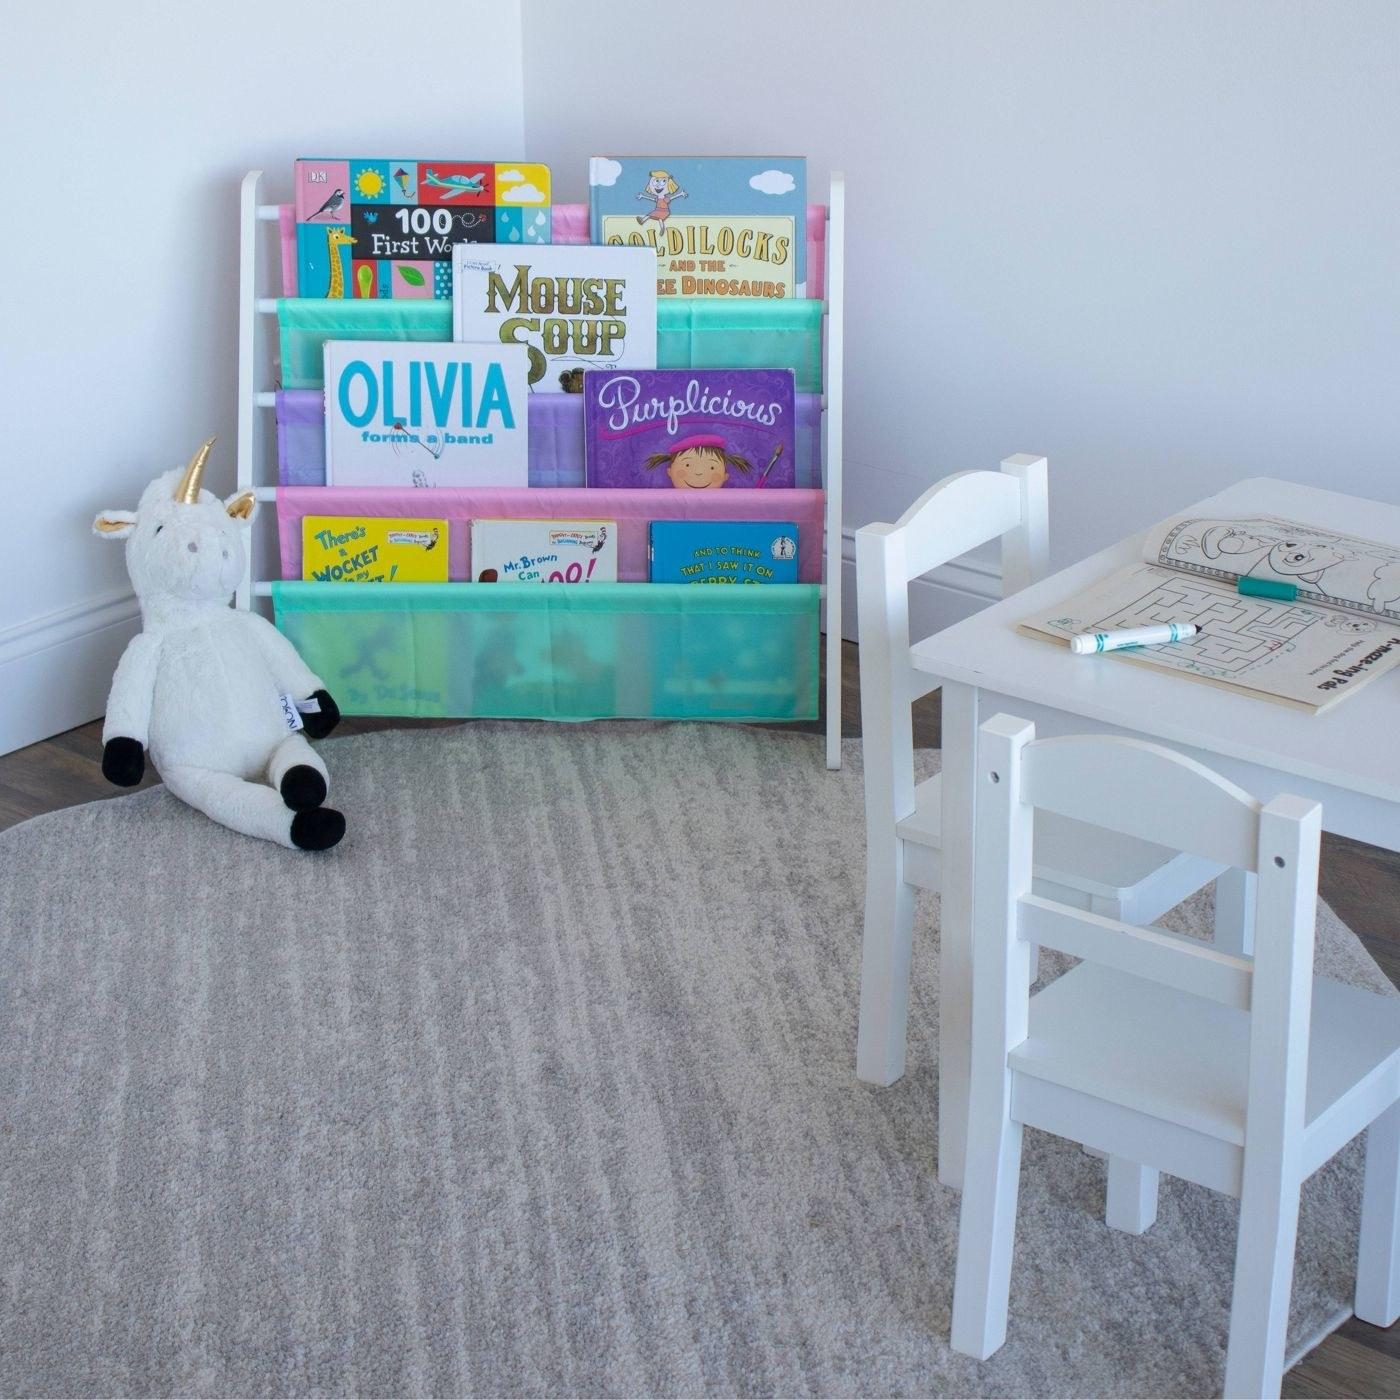 the white and pastel children's bookshelf displaying several books